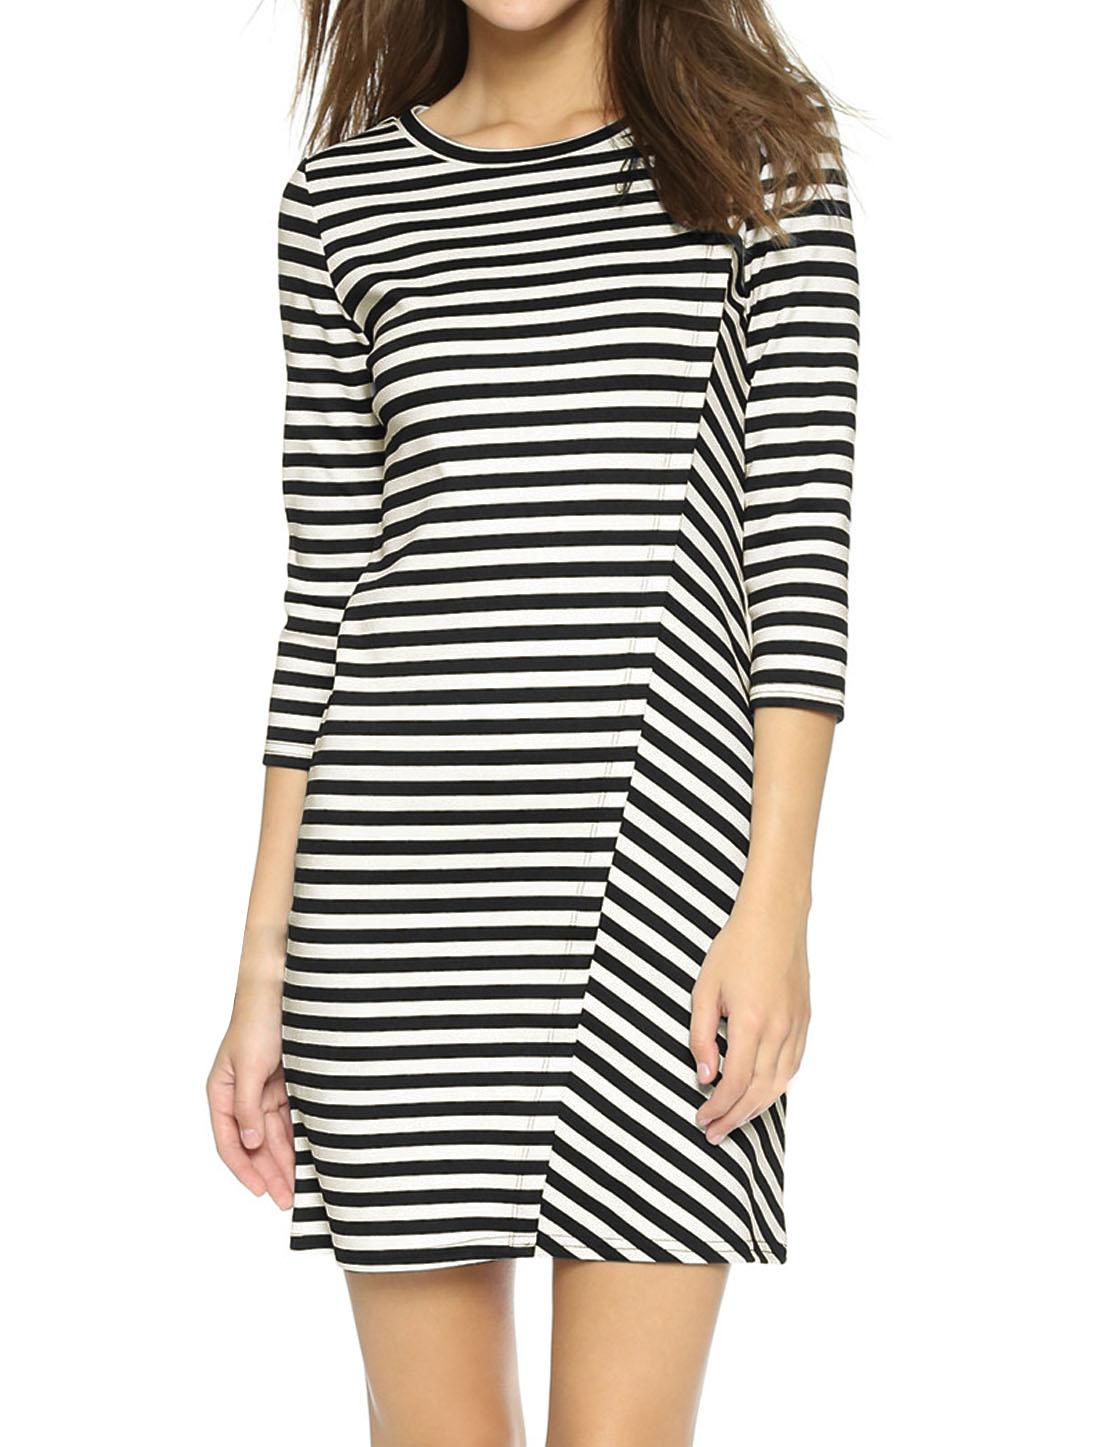 Women Round Neck 3/4 Sleeves Stripes Prints Casual Sheath Dress White M